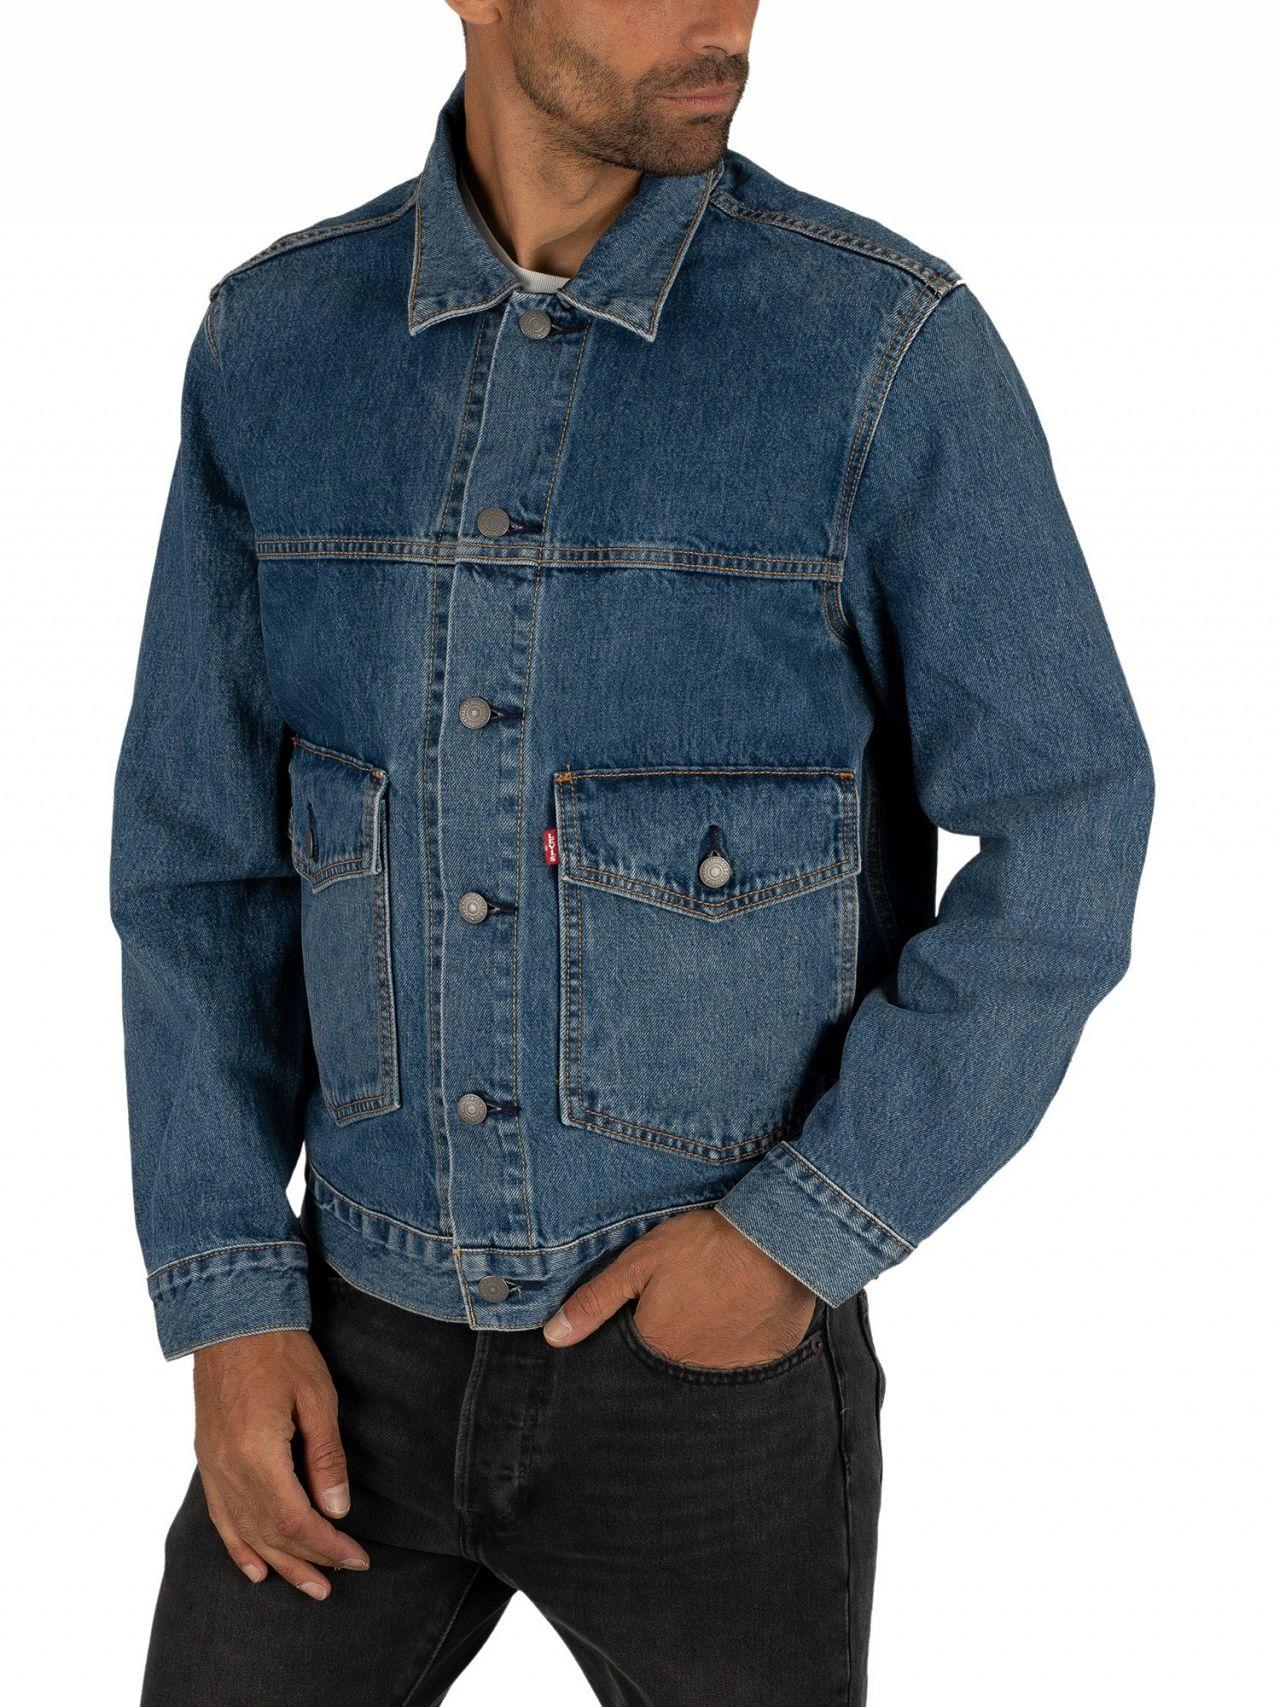 7c46ede1 Levi's Gear Box Patch Pocket Trucker Jacket | Standout